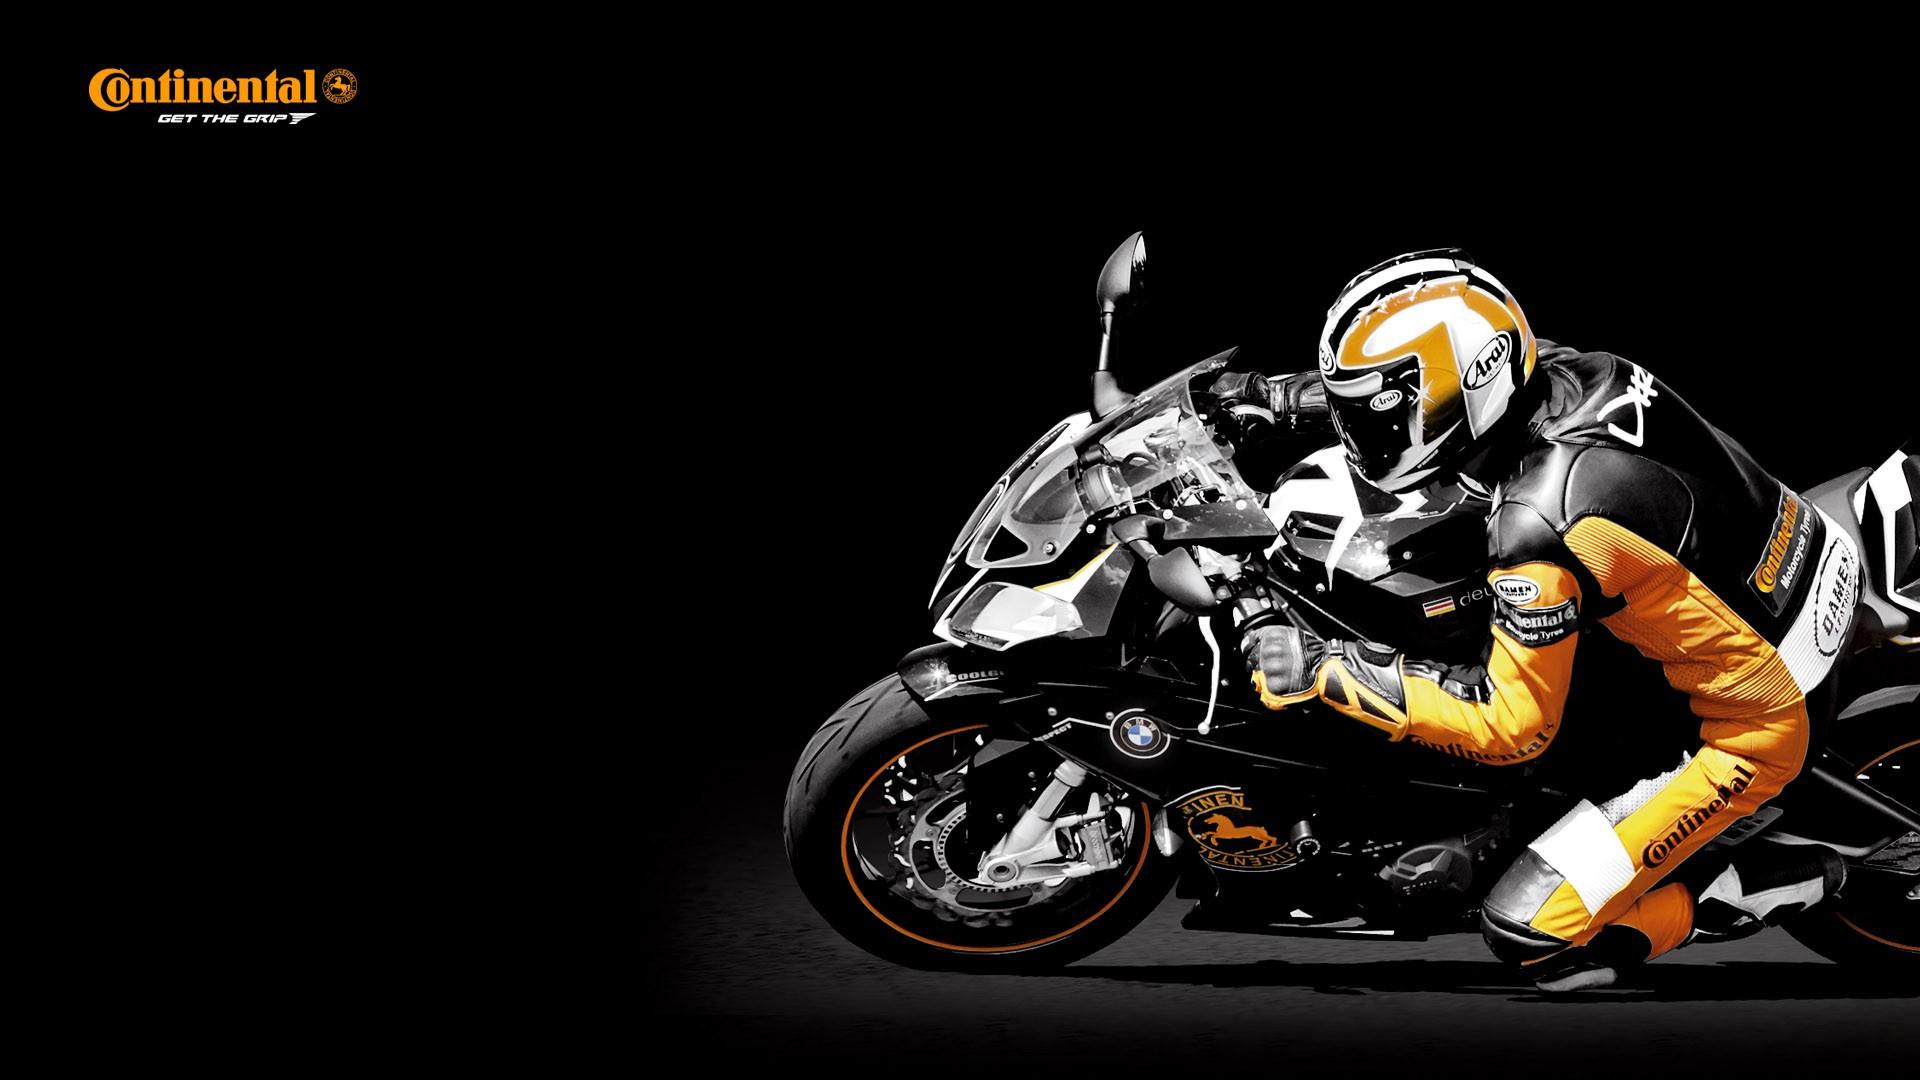 Superbike Hd Wallpaper Full Screen: Motorbike Wallpaper HD